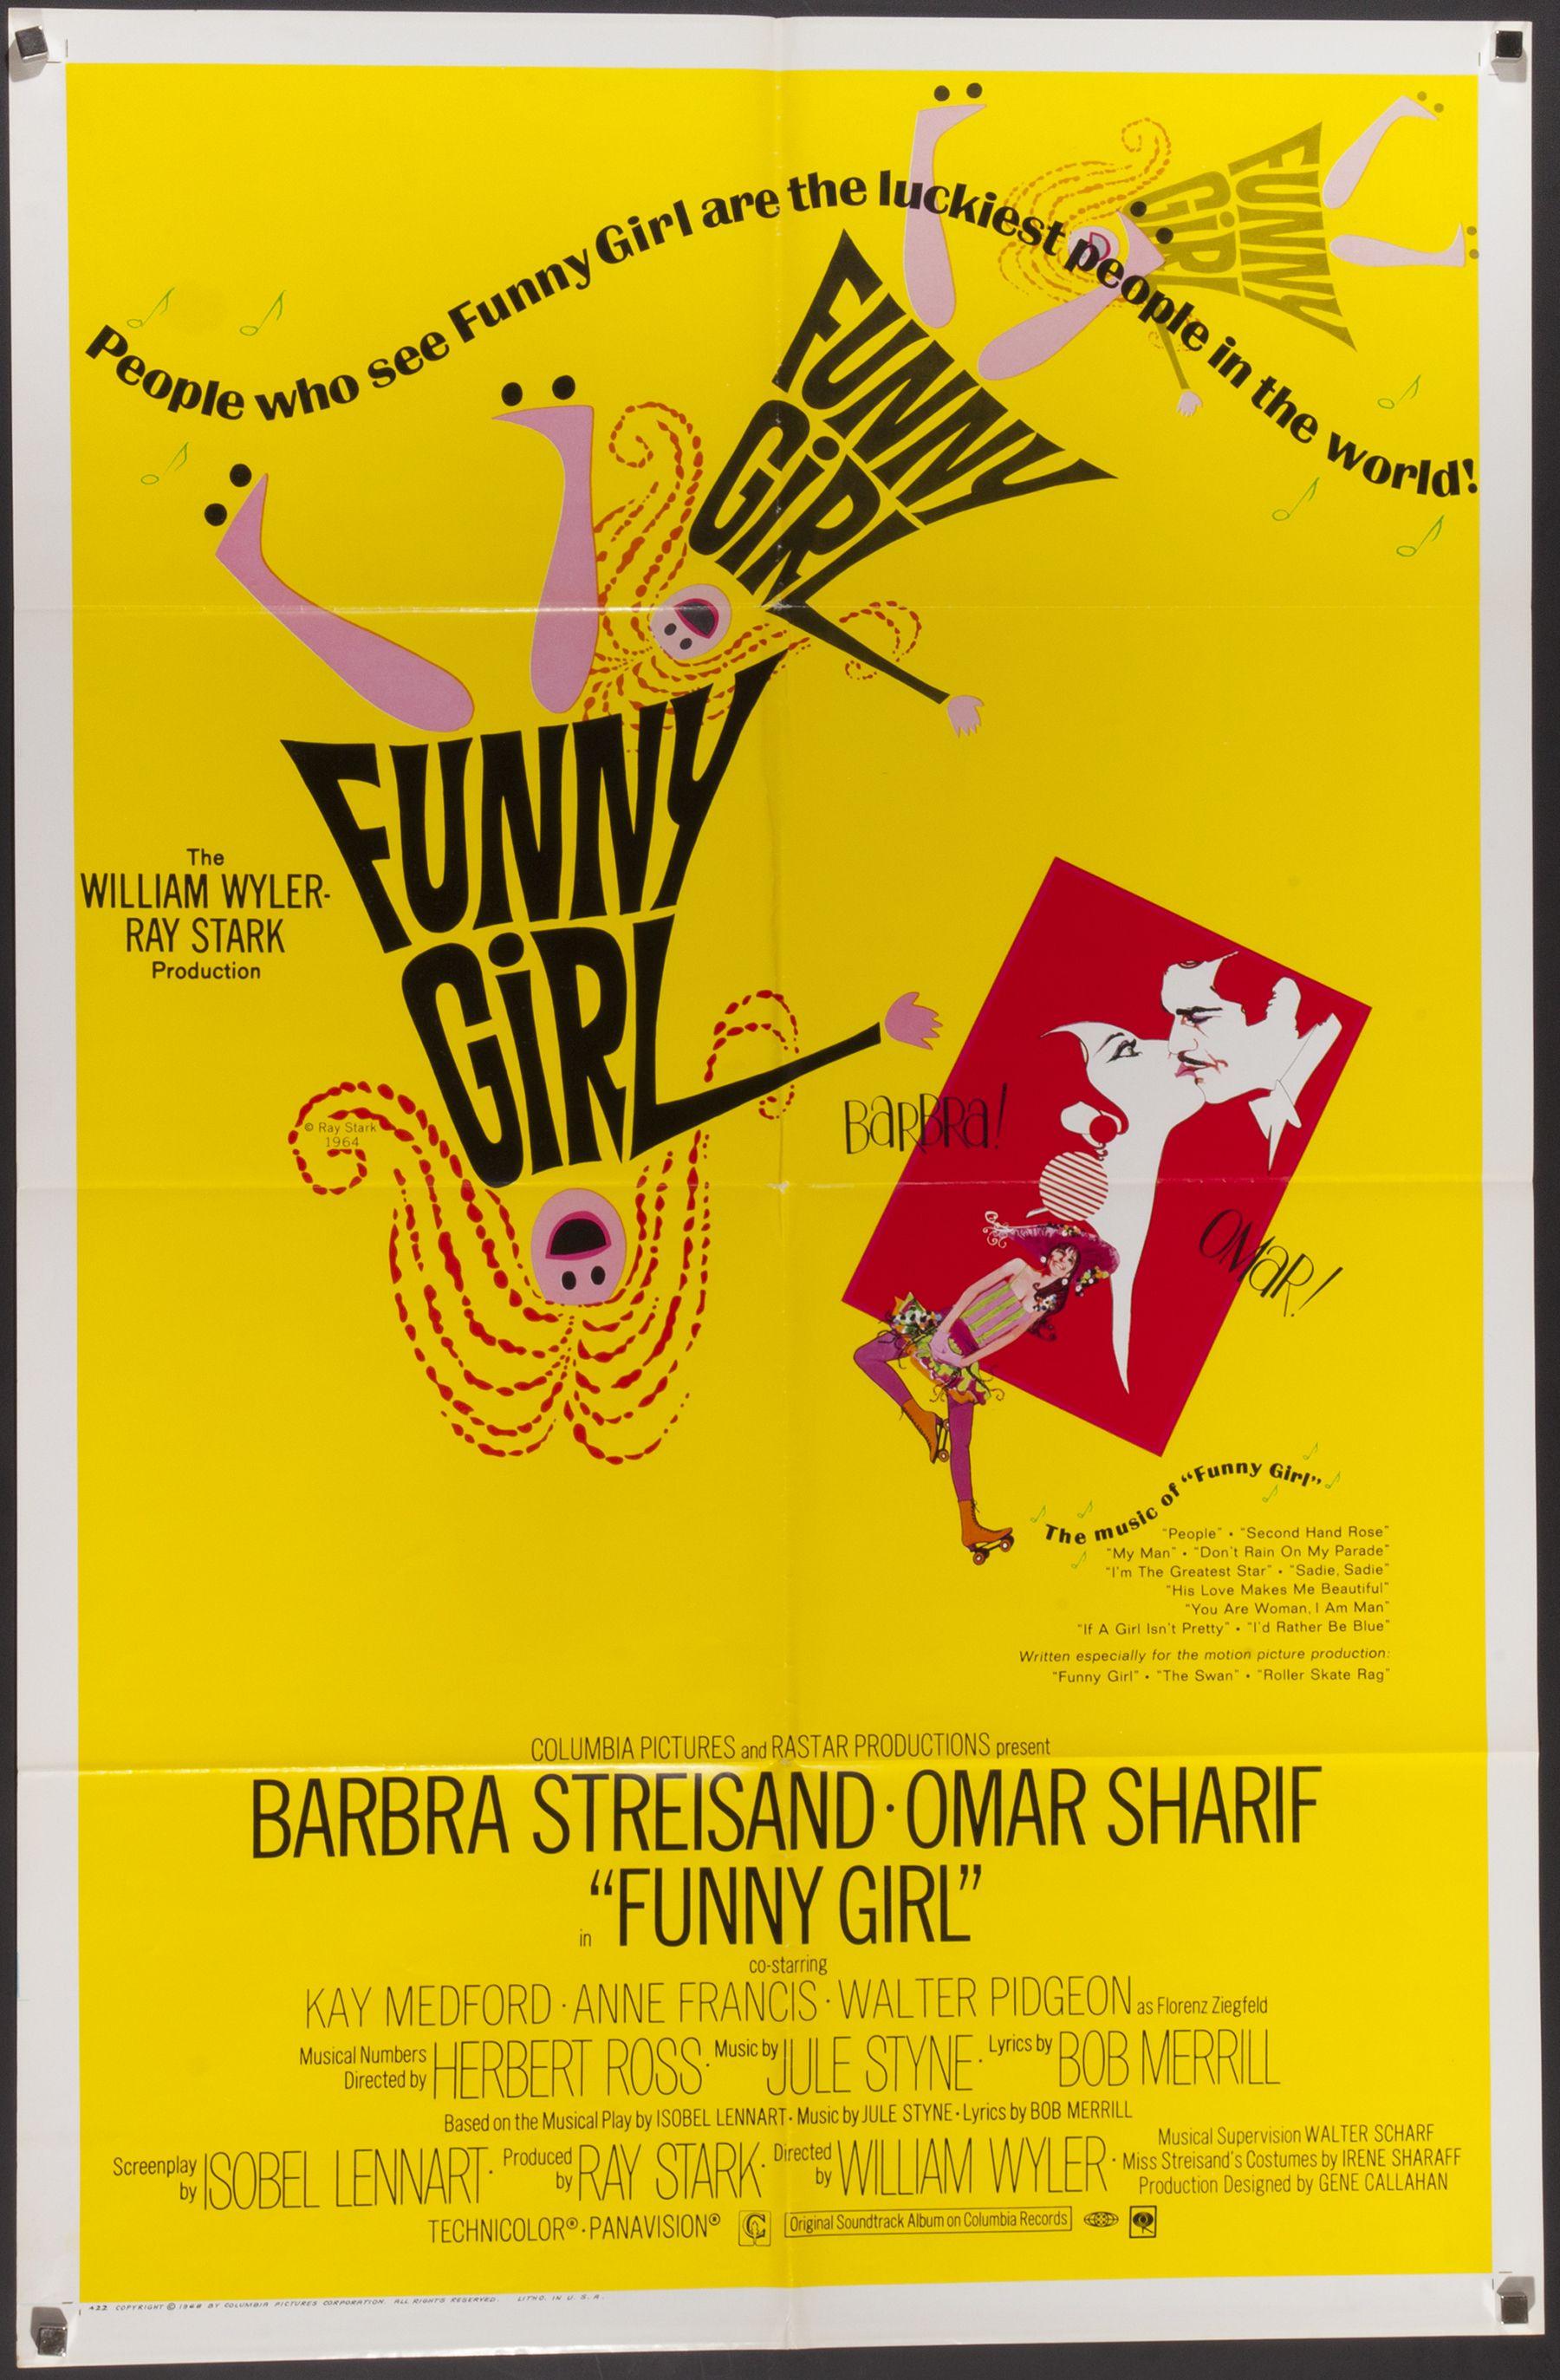 Original Funny Girl 1968 Film Poster | Chairish